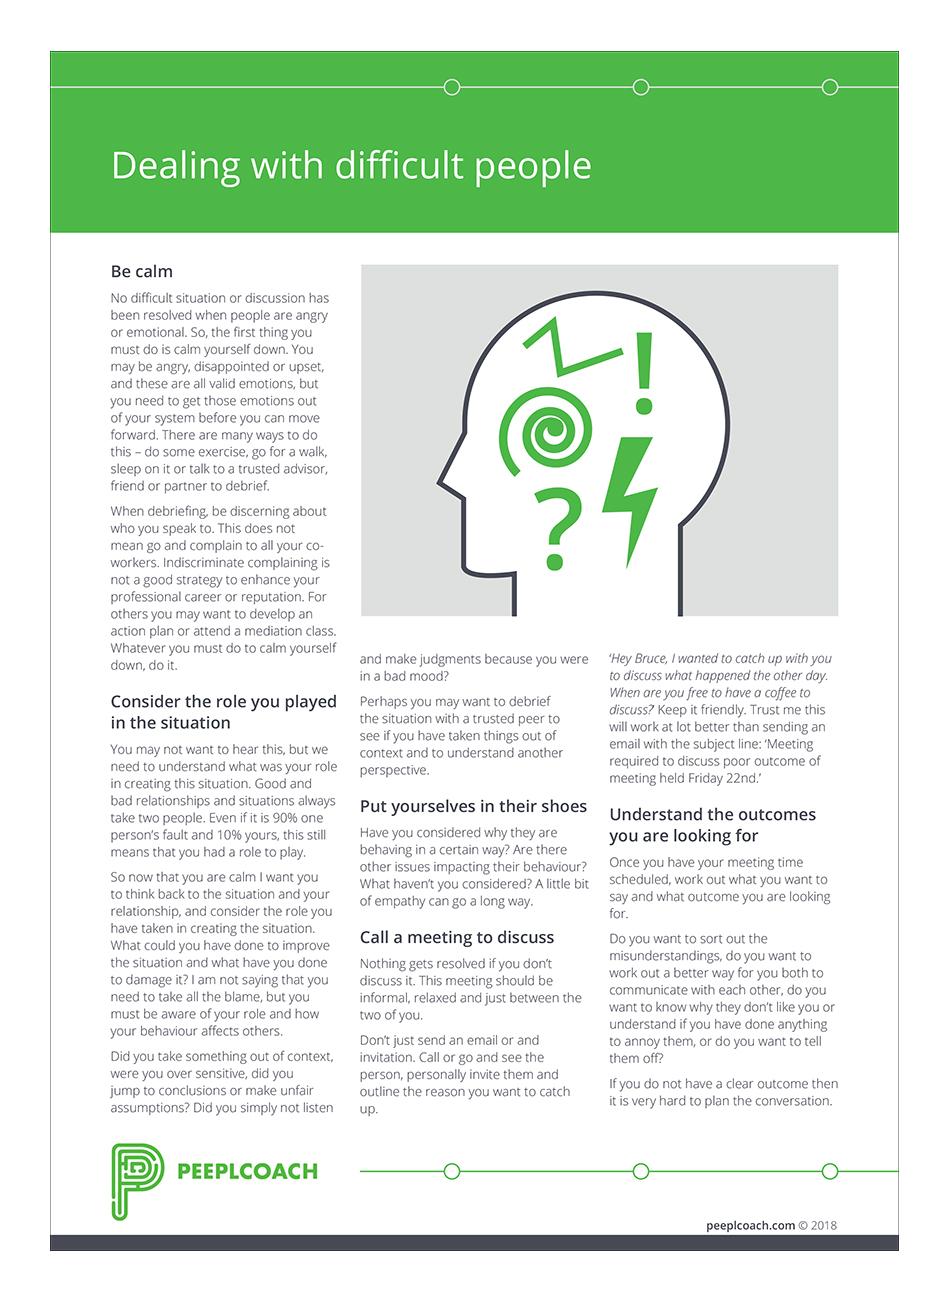 Peeplcoach-information-sheets-graphic-design.jpg